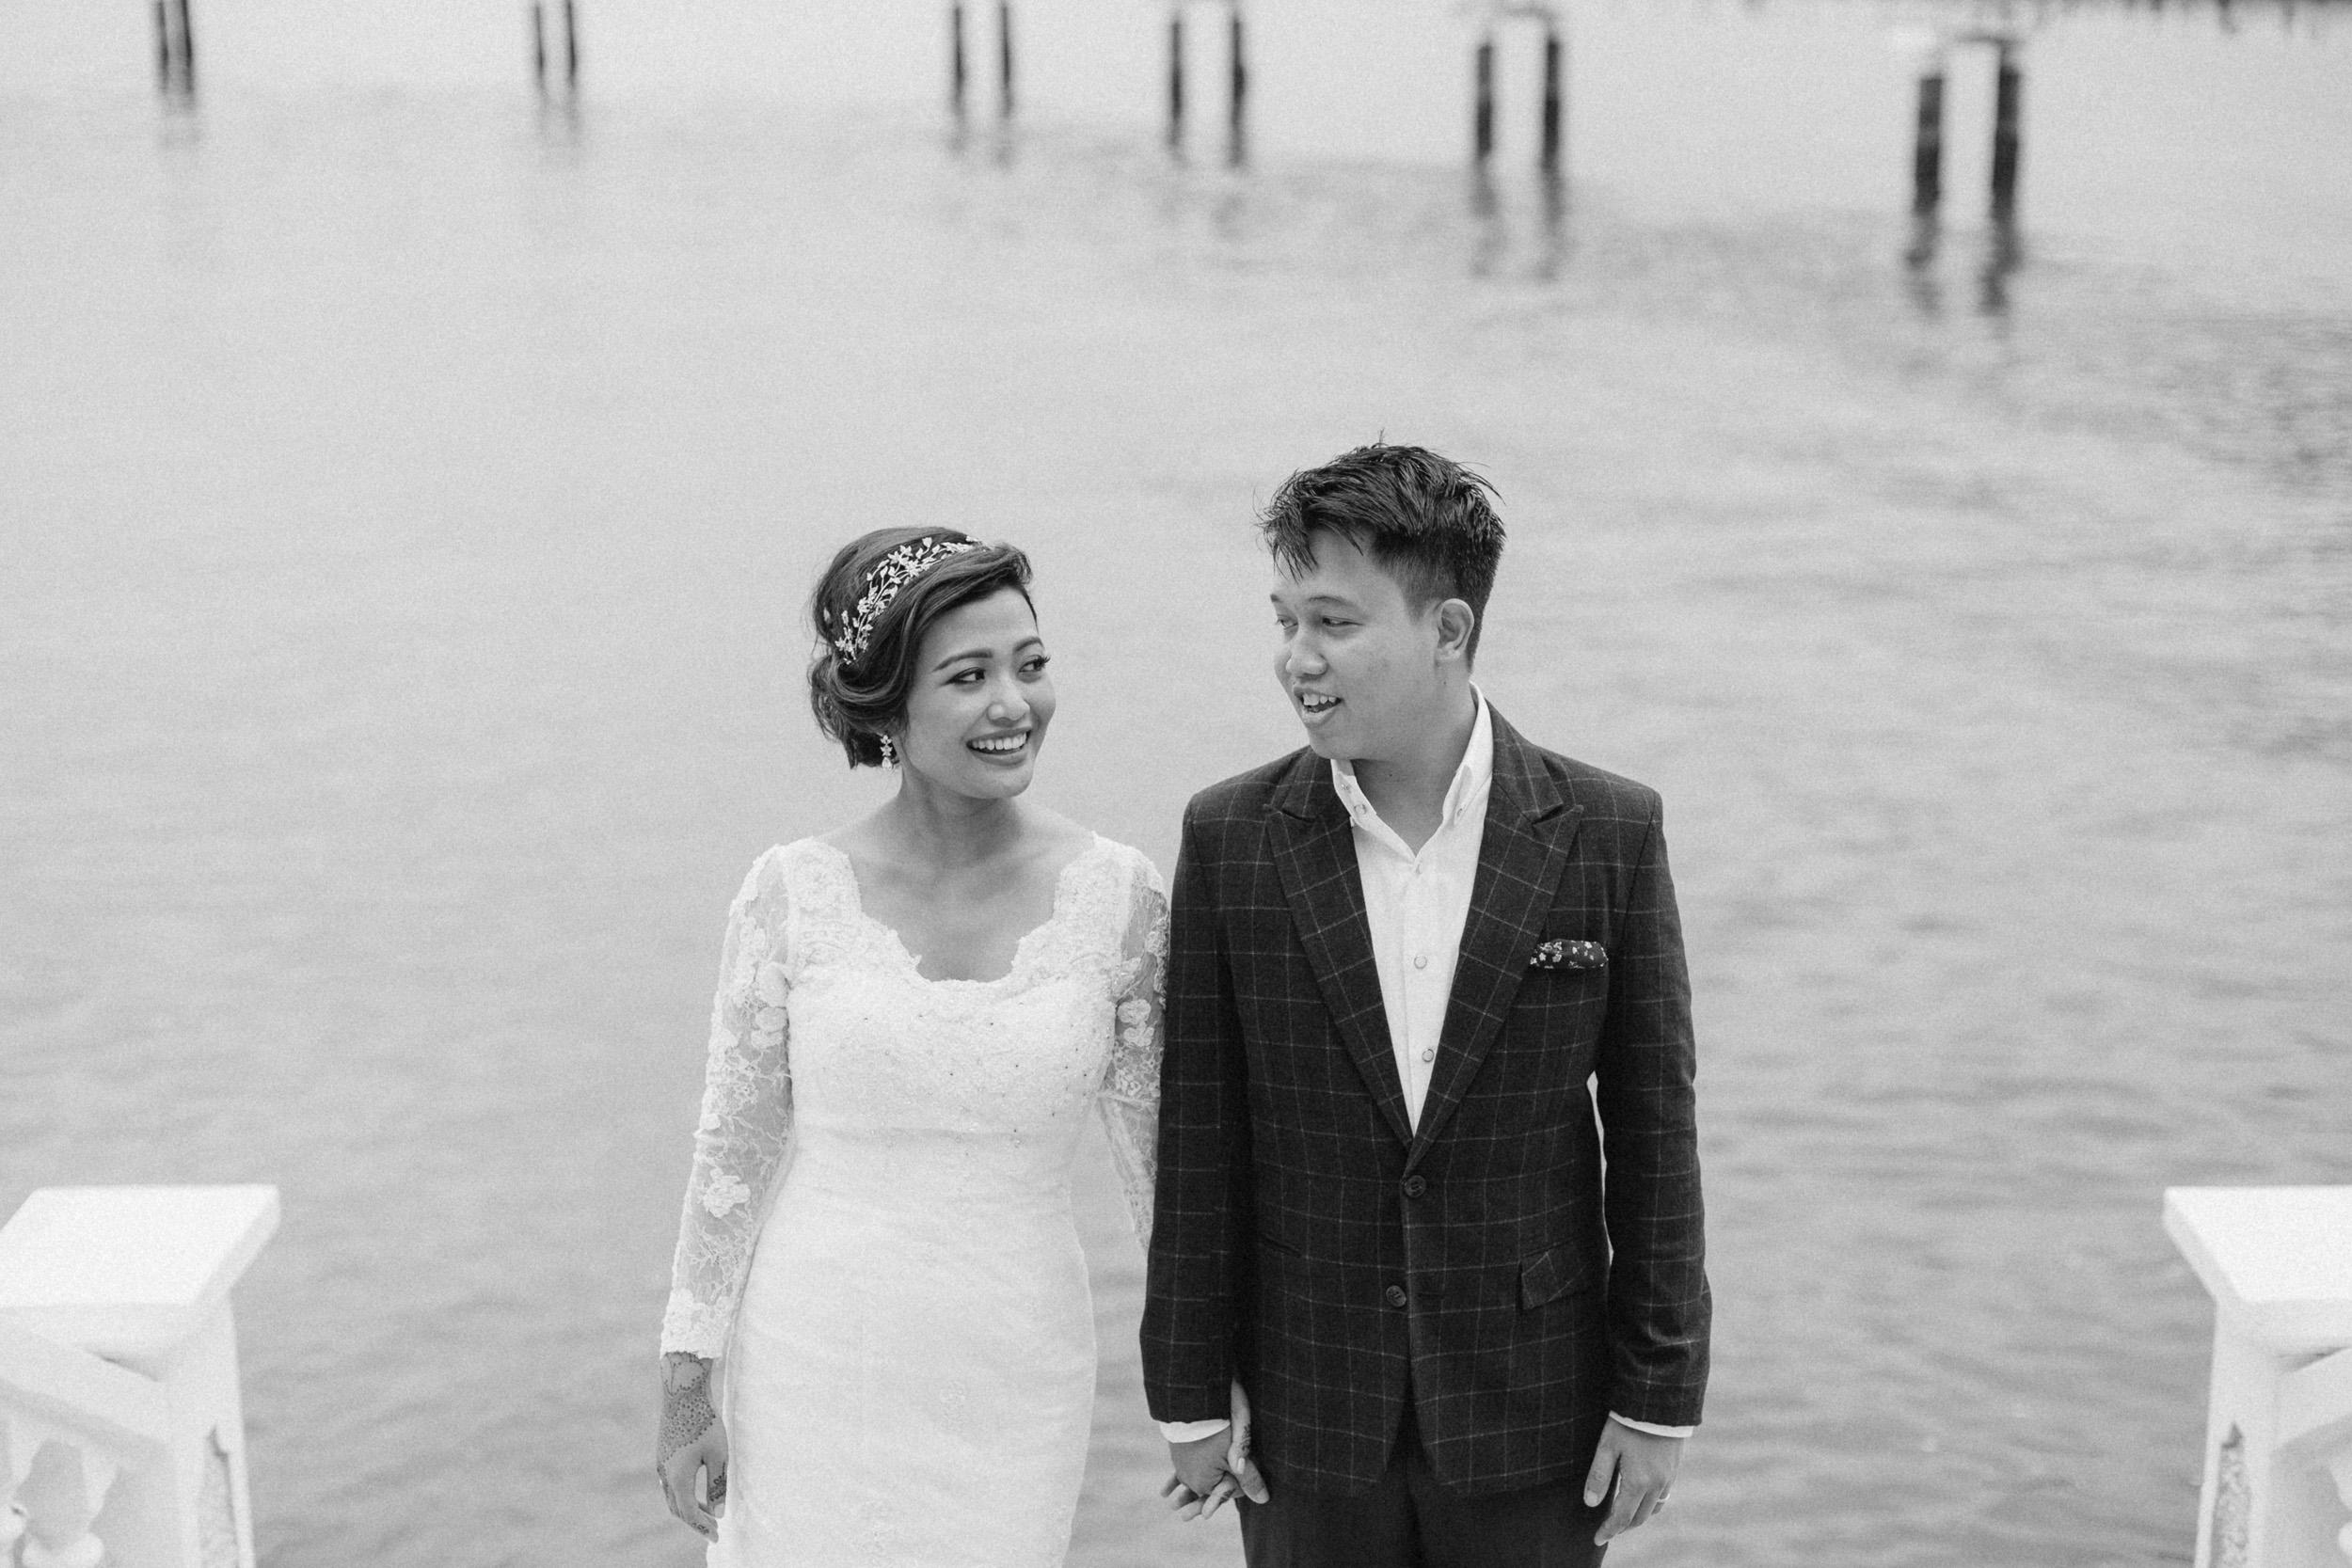 singapore-wedding-photographer-photography-wmt2017-077.jpg